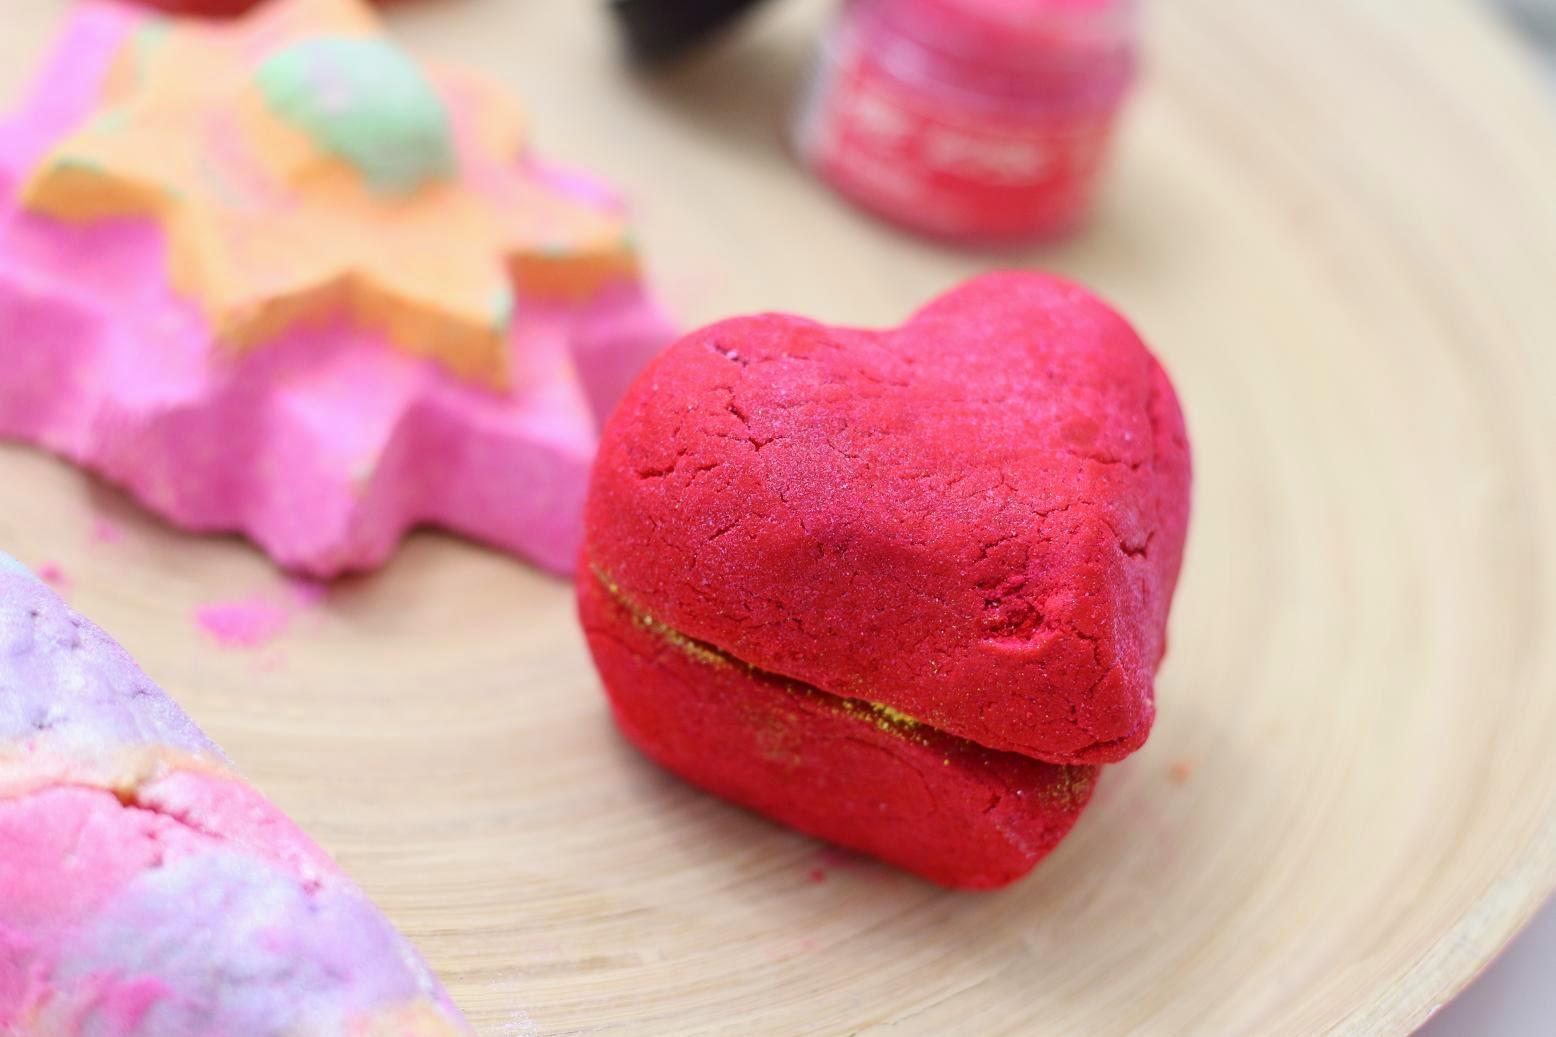 Lush Heart Throb Bubbleroon